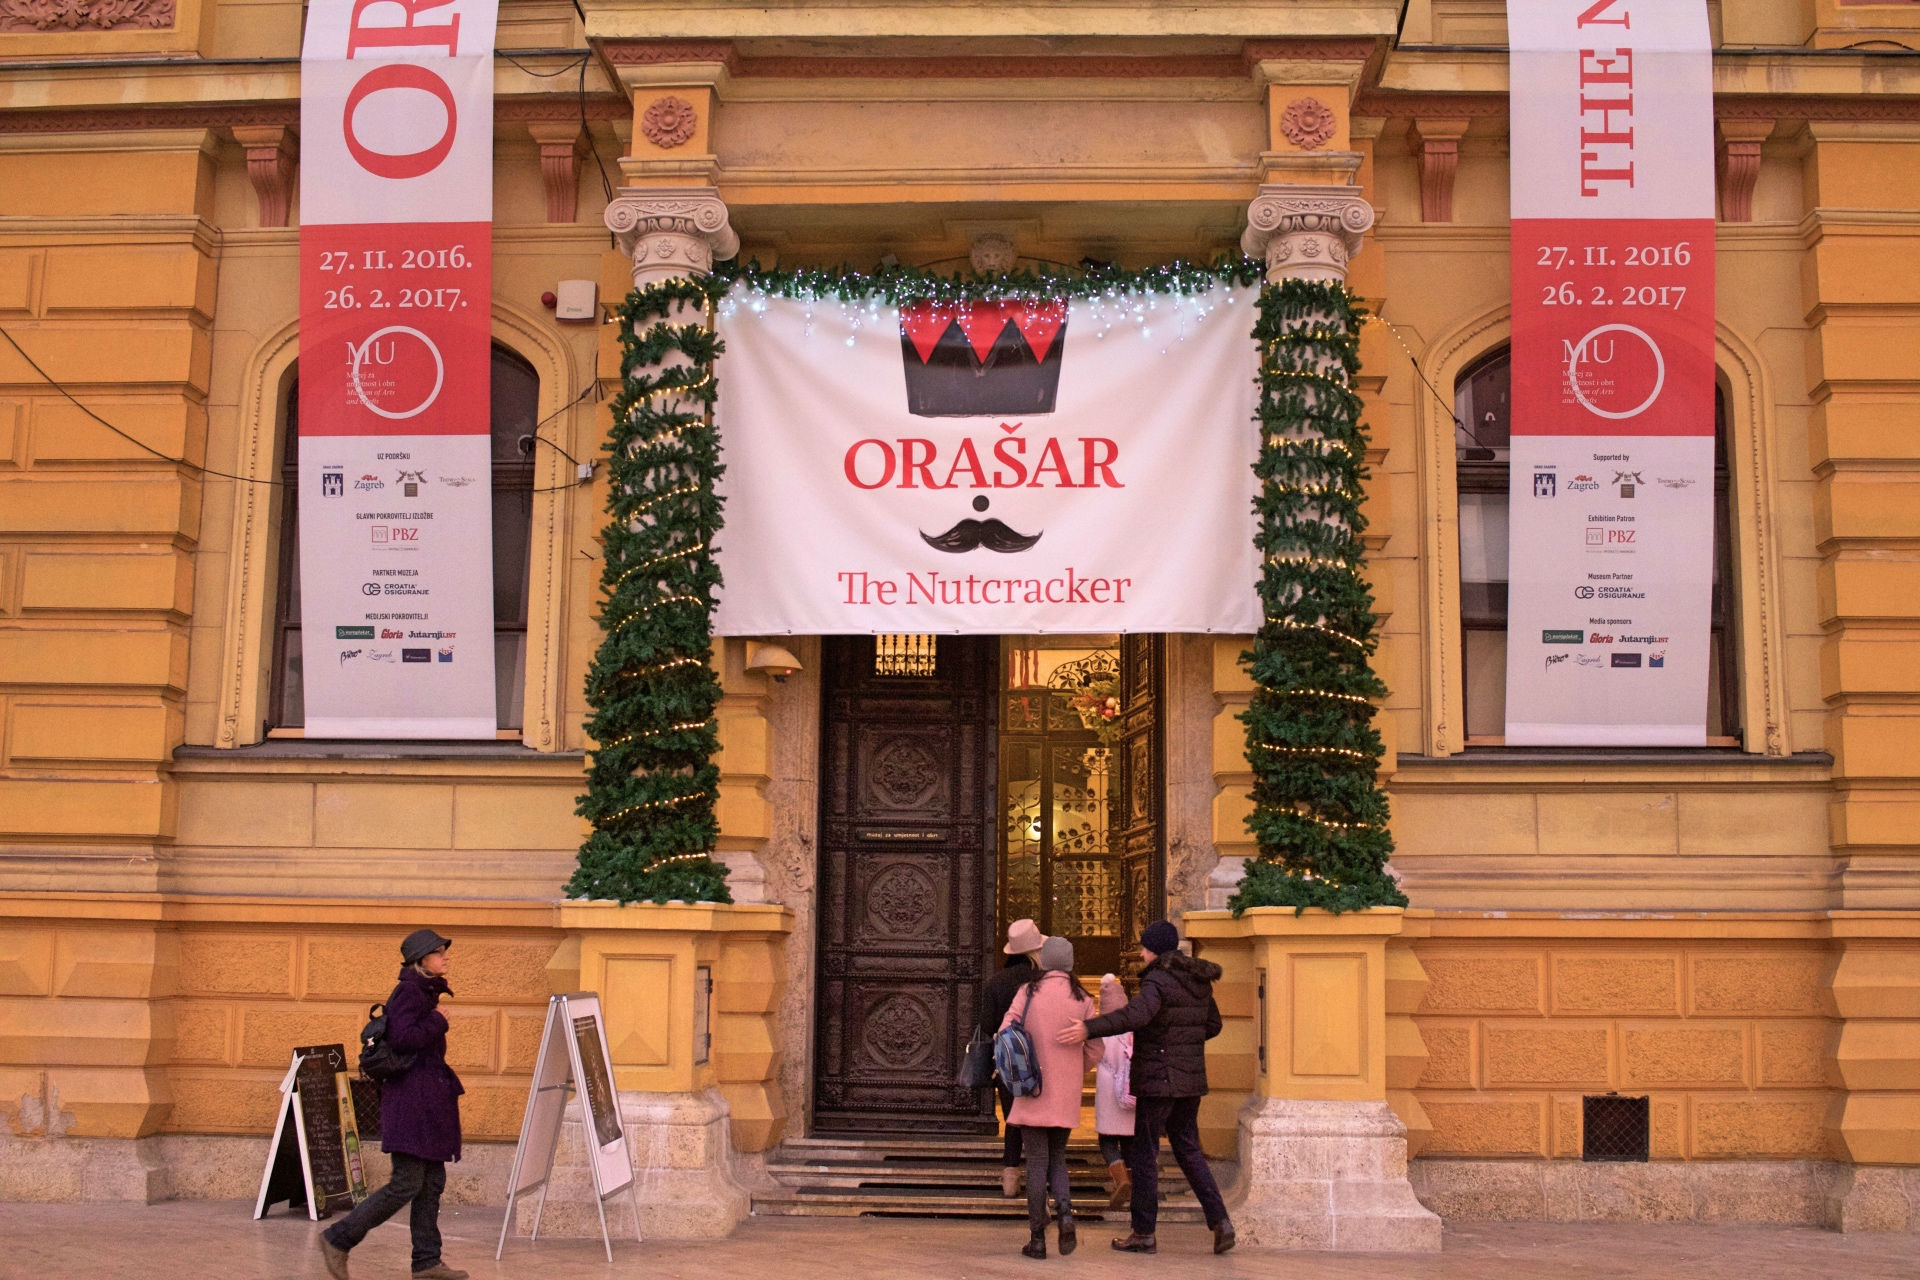 orasar1